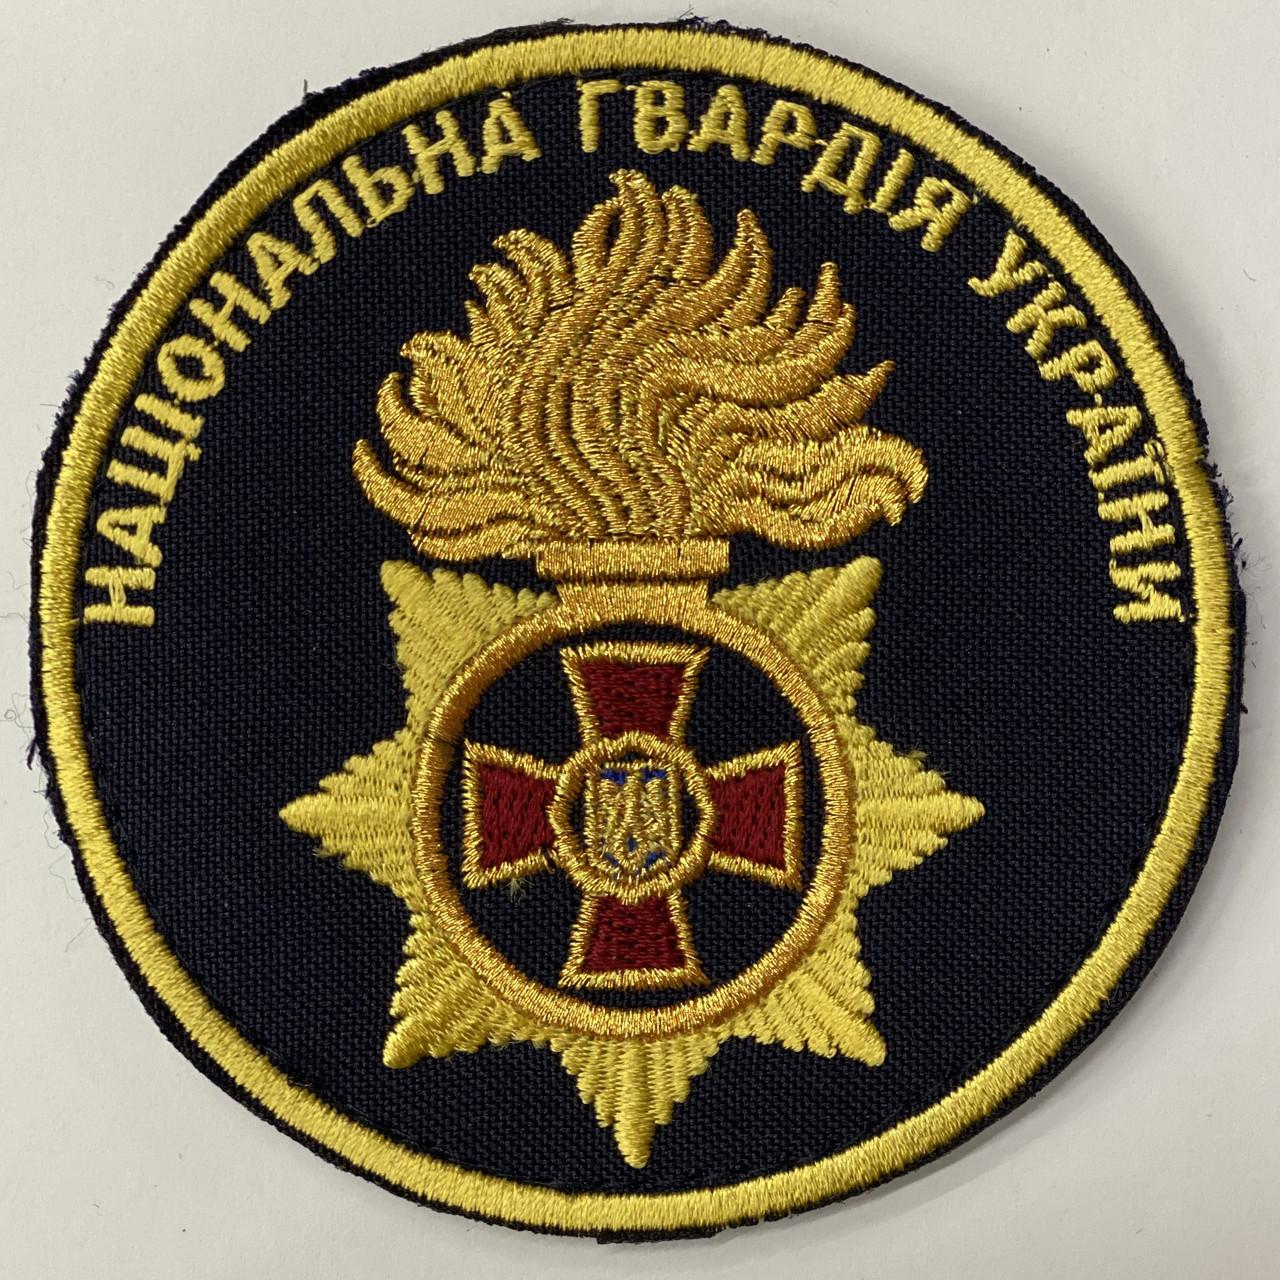 Шеврон Національна гвардія України (пламя)